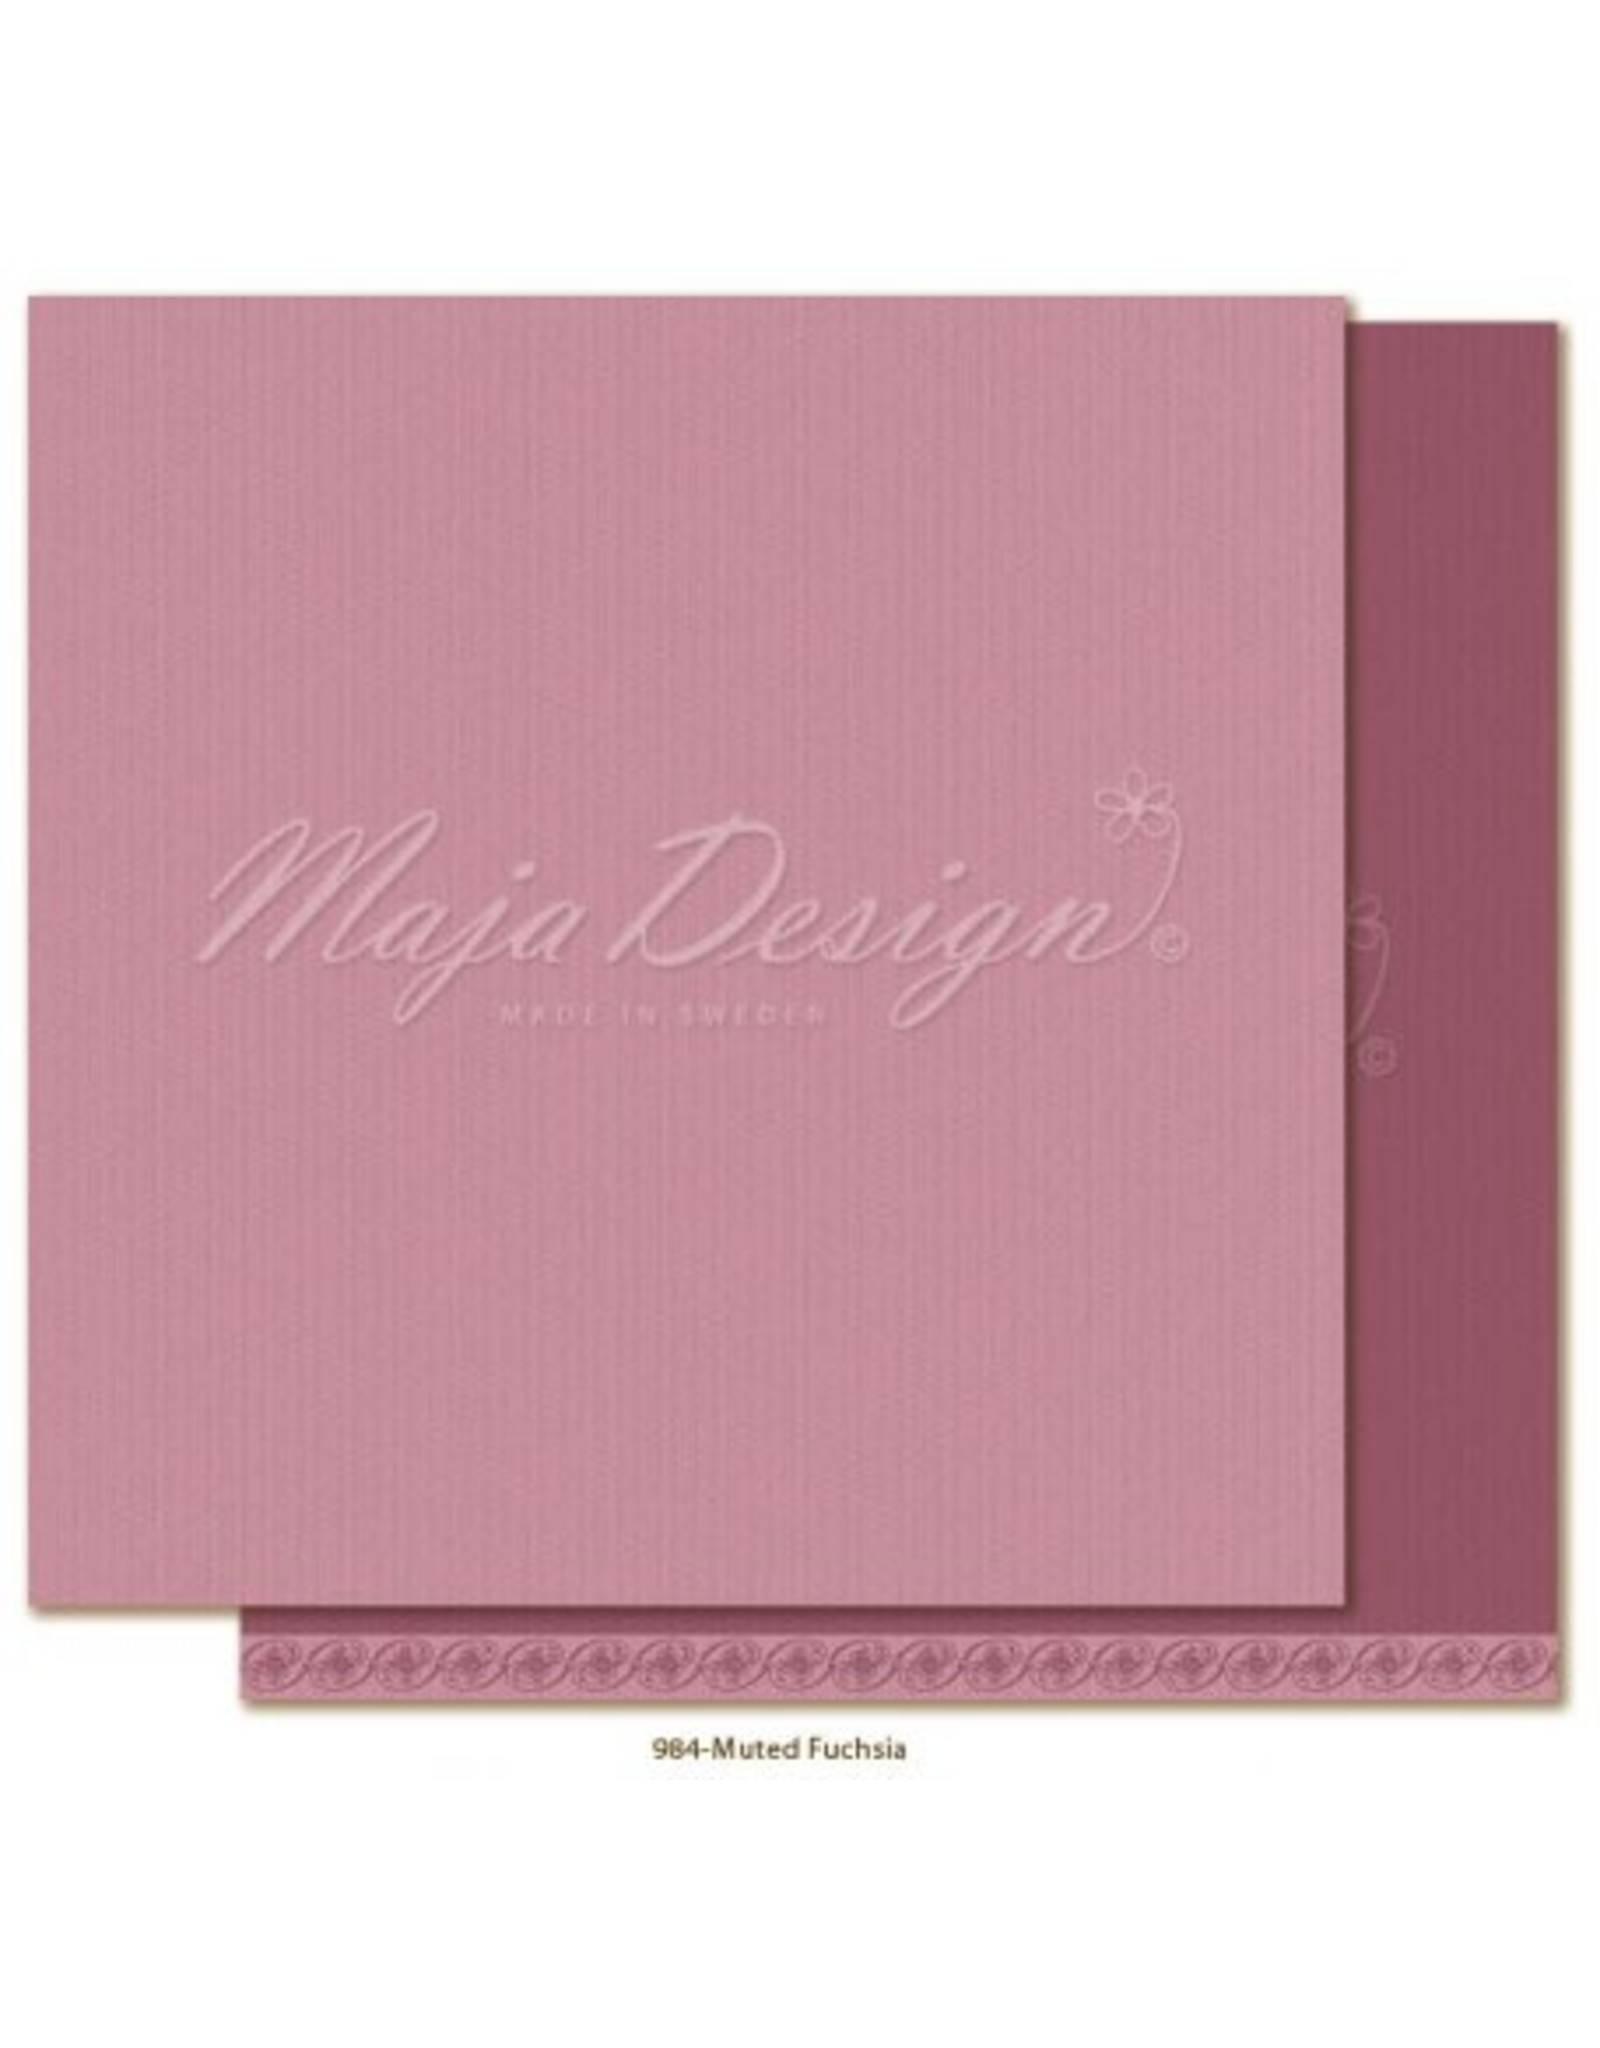 Maja Design Maja Design Monochromes Shades of Celebration Muted Fuchsia